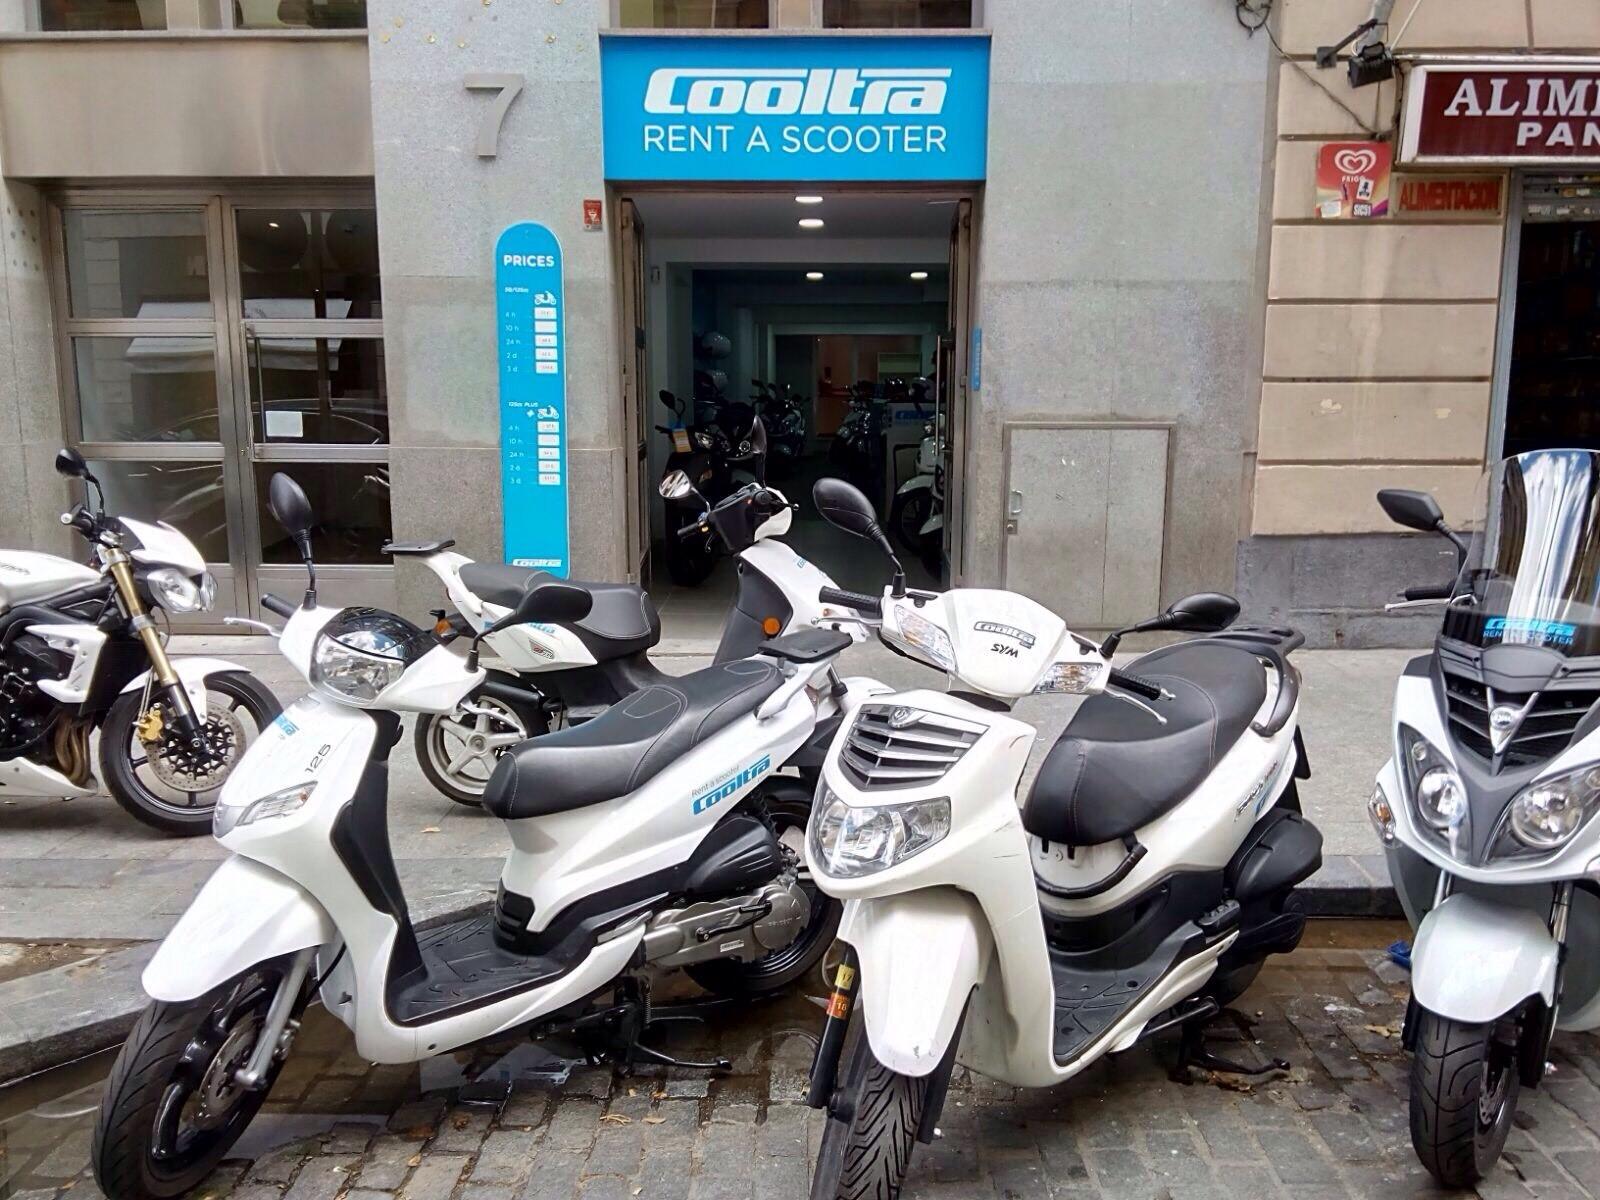 cooltra shop madrid